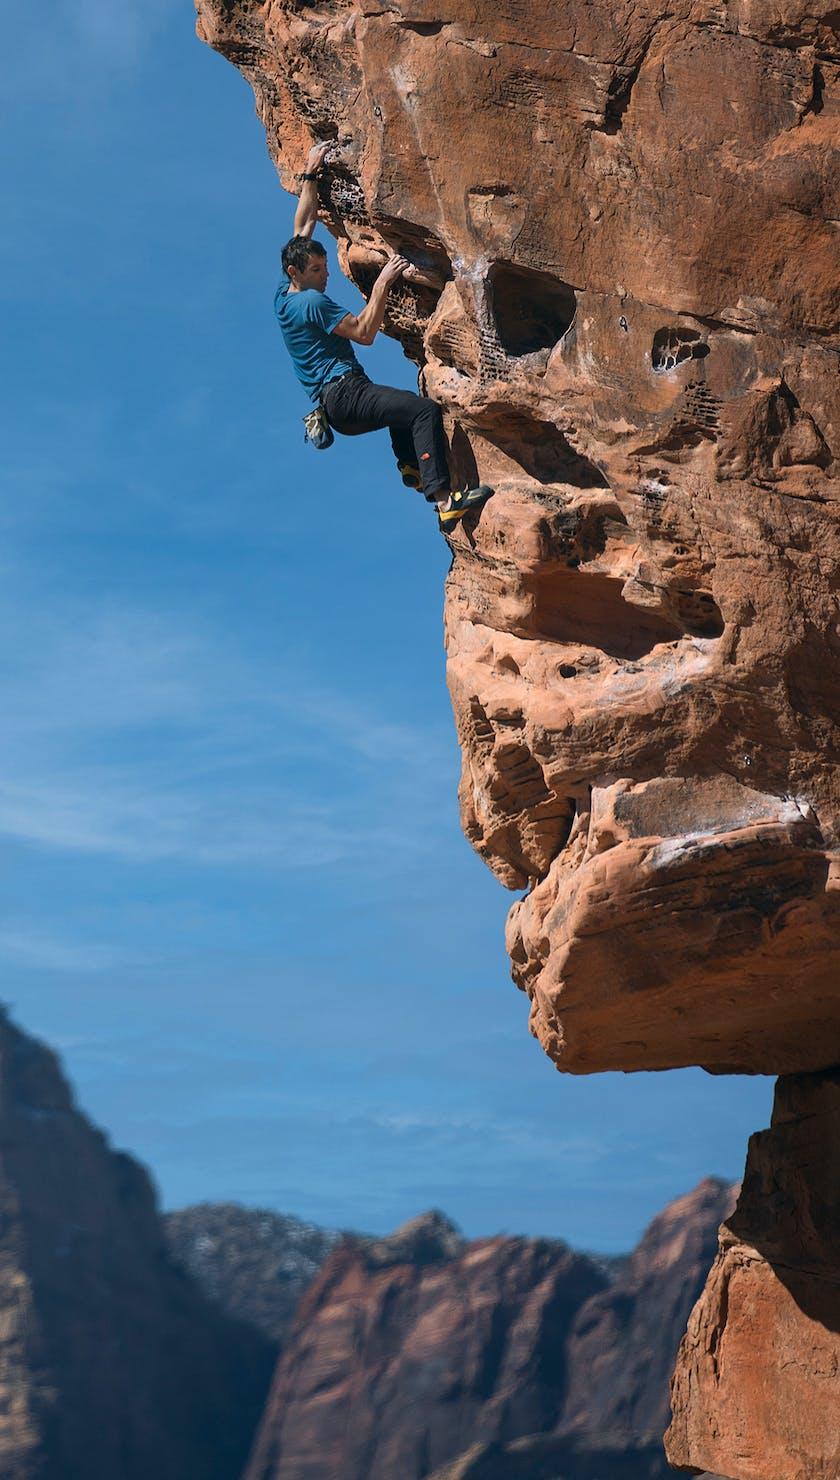 BD Athlete Alex Honnold bouldering in Nevada, USA